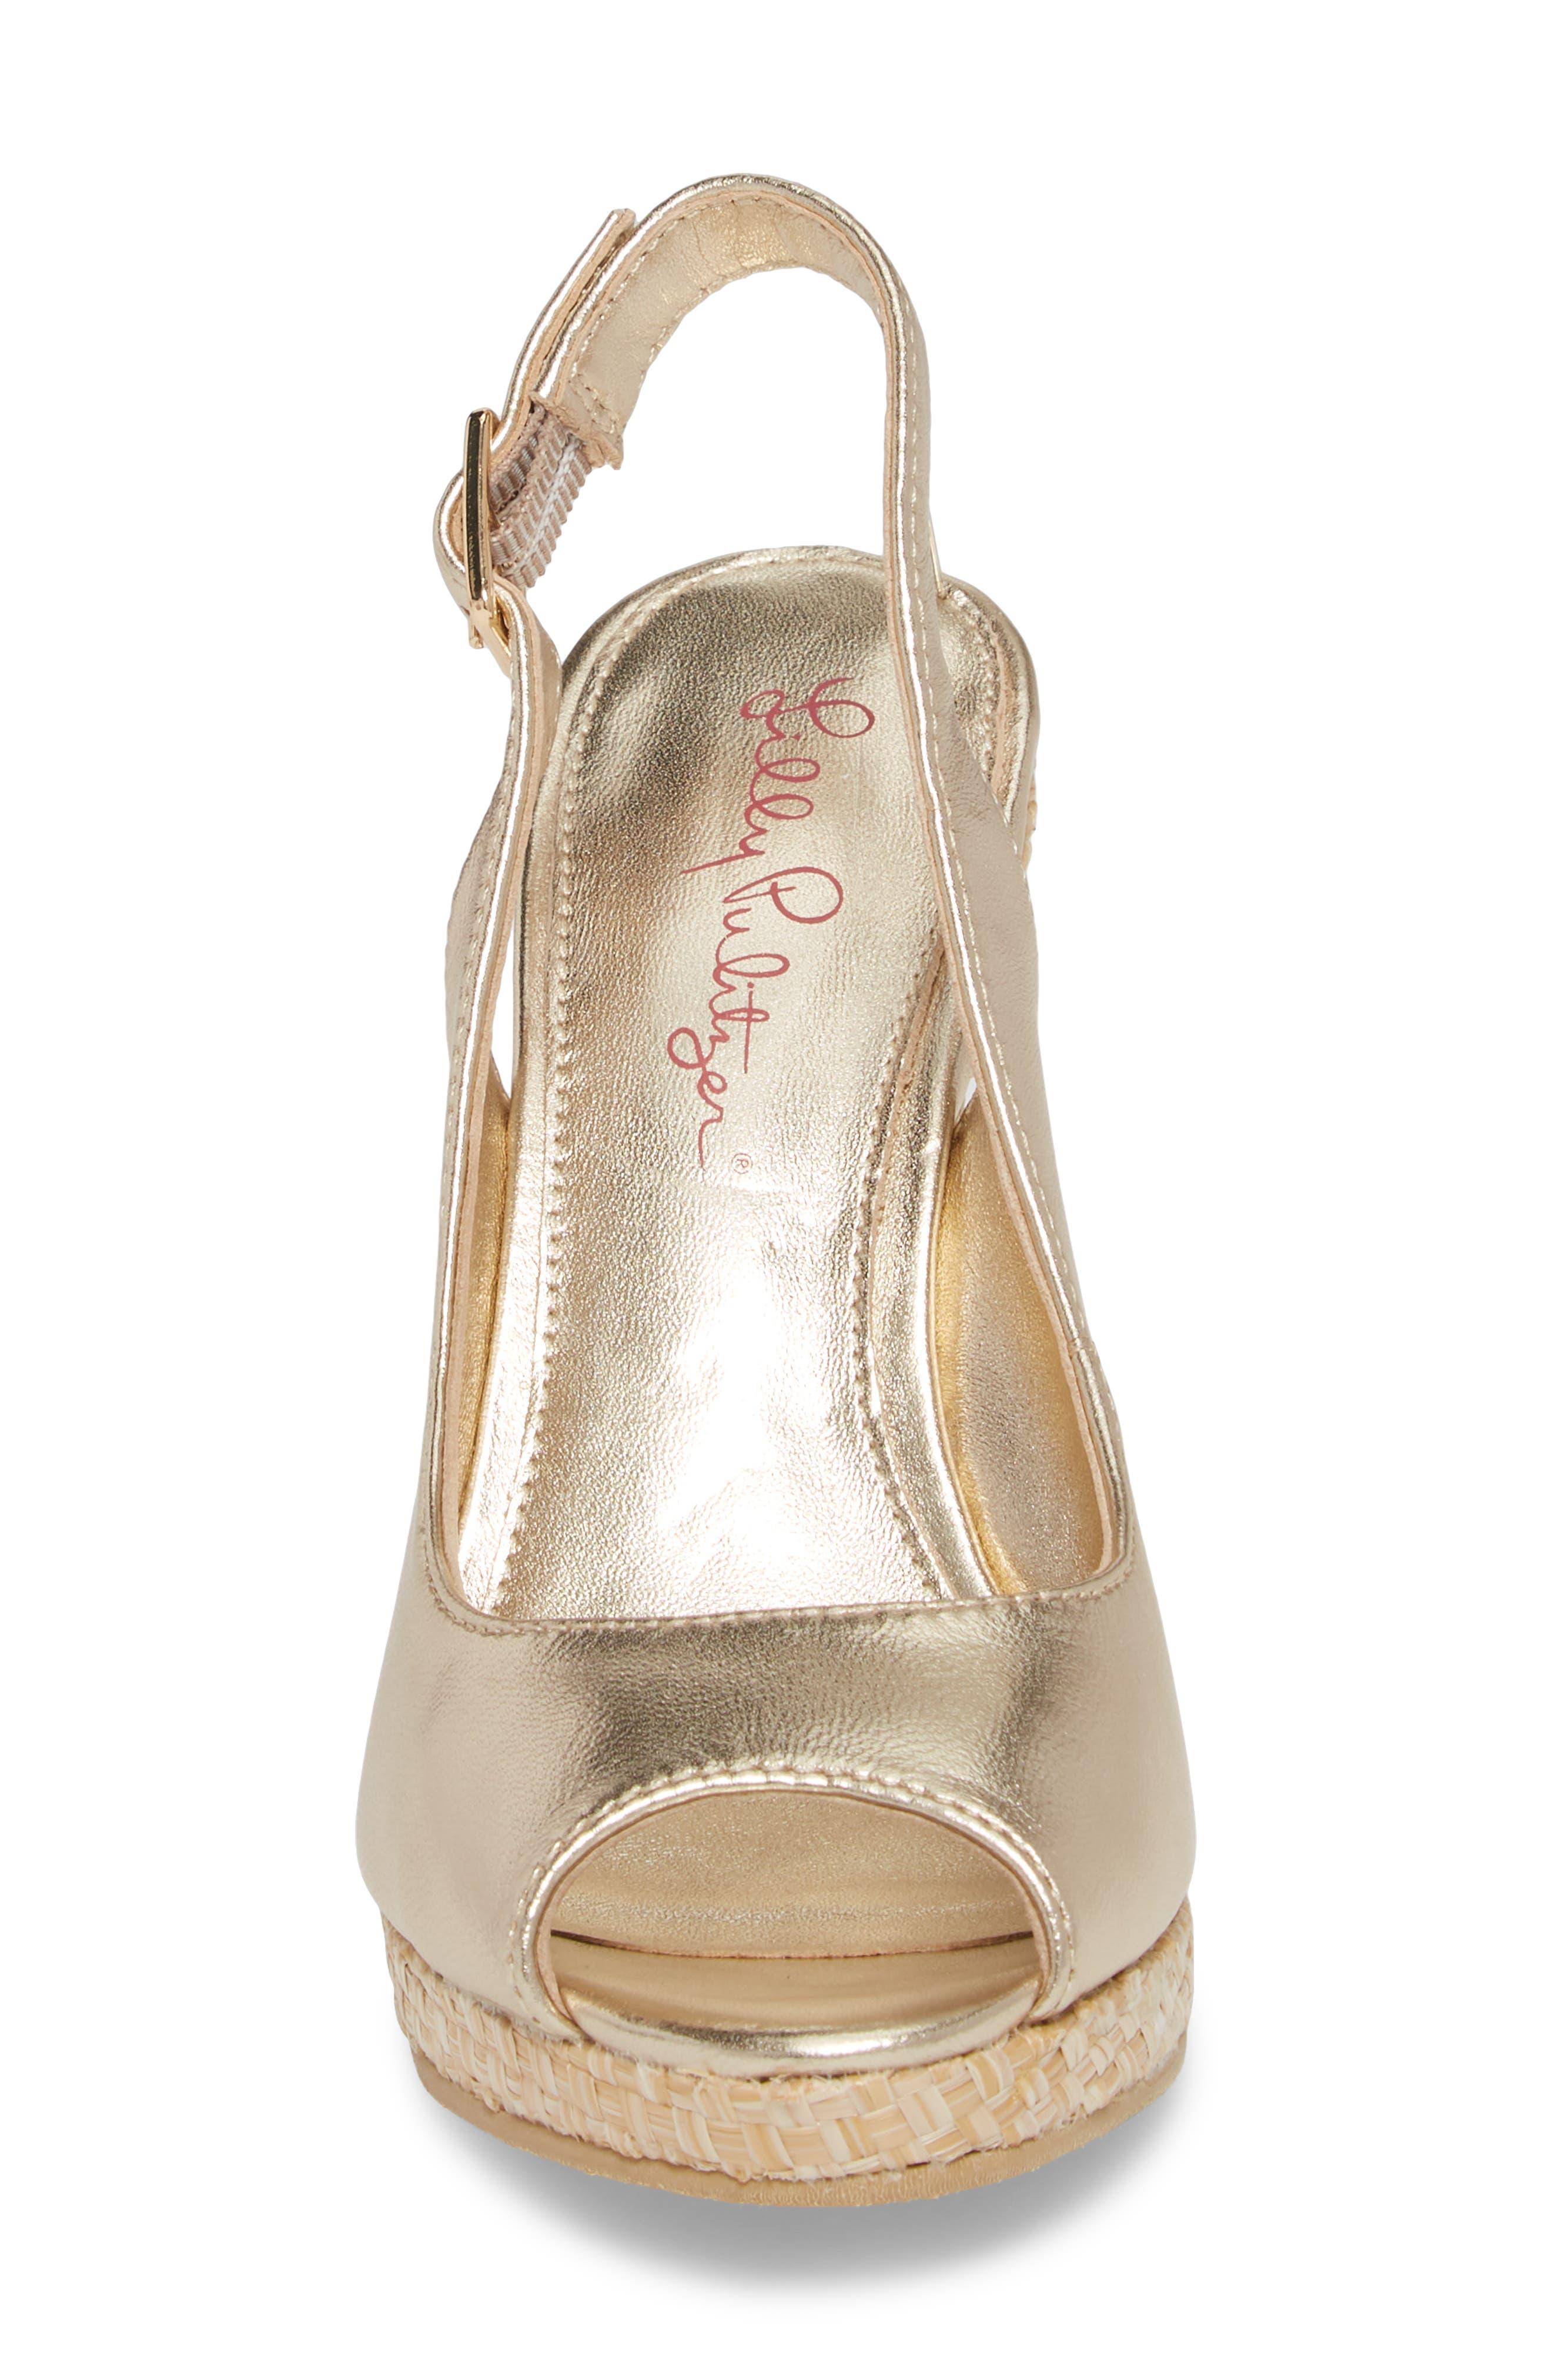 Kristin Slingback Wedge Sandal,                             Alternate thumbnail 4, color,                             GOLD METALLIC LEATHER